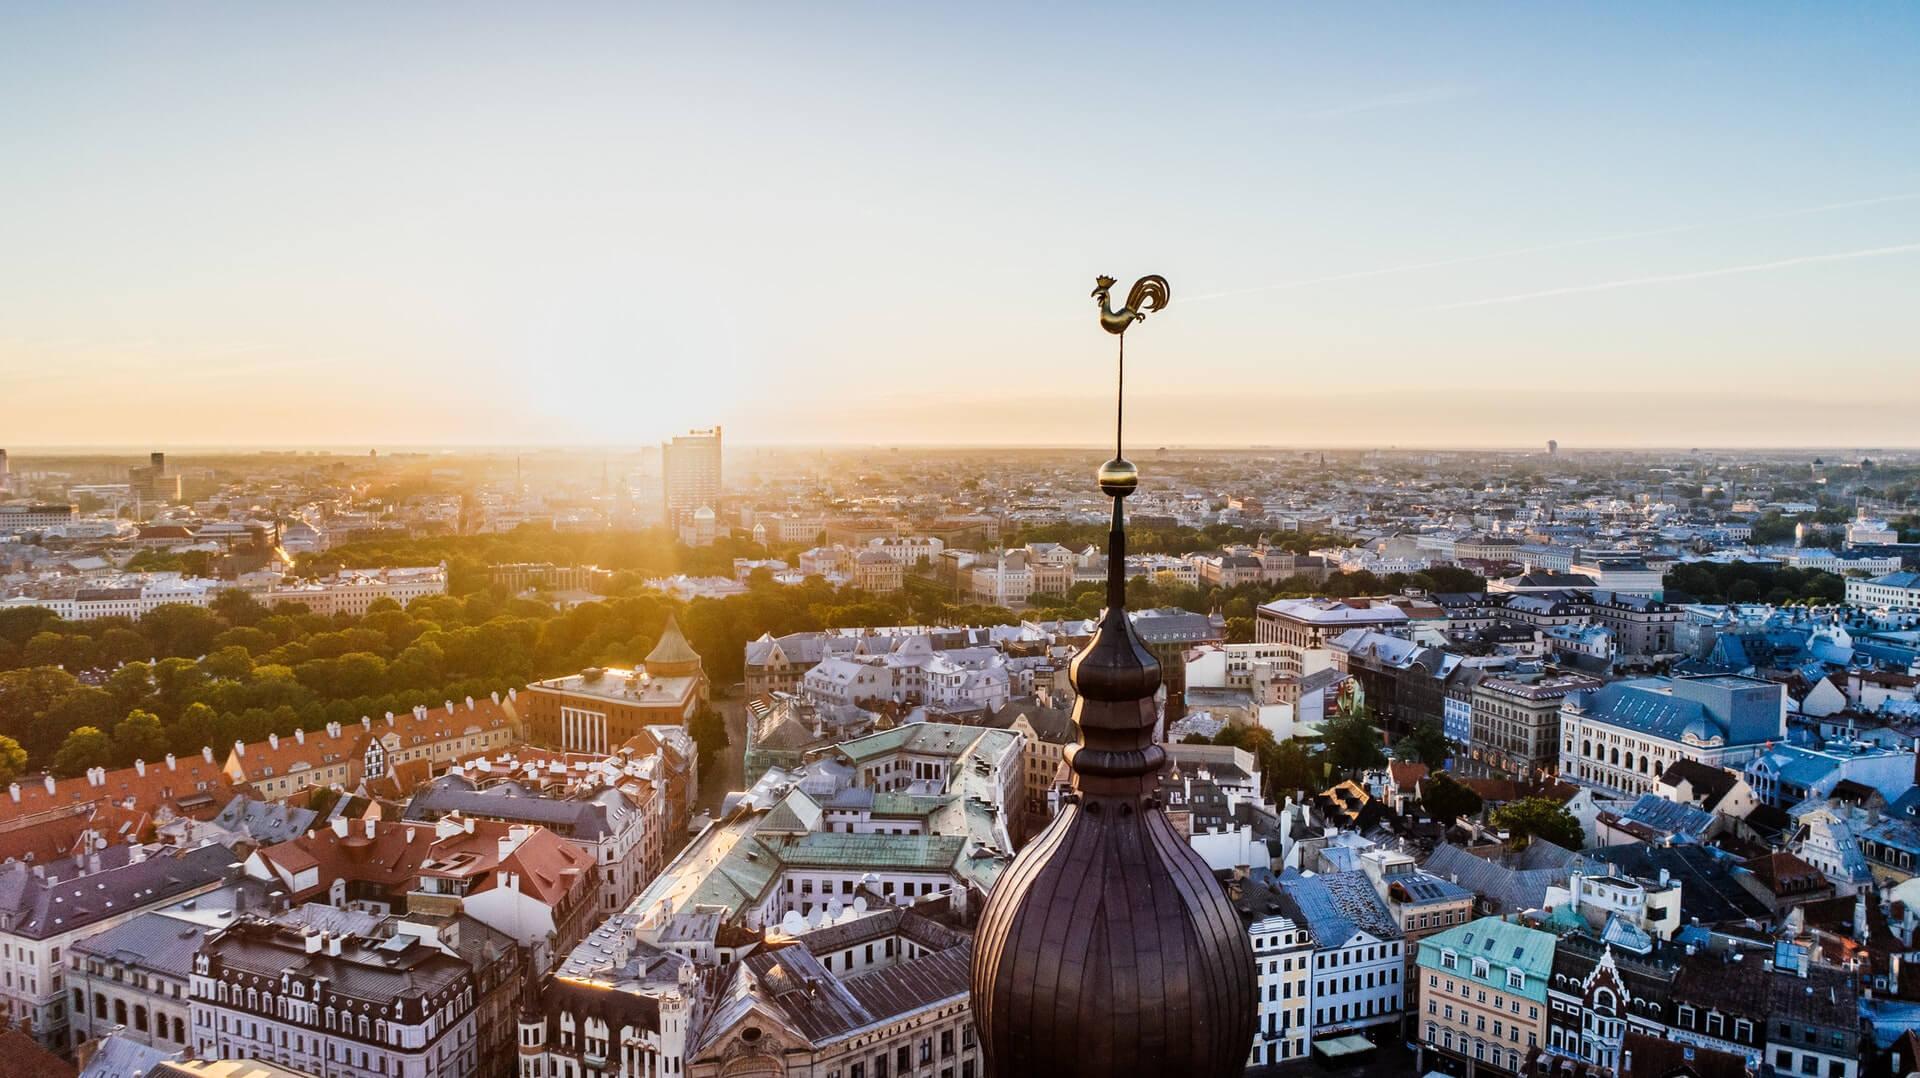 TEFL in Europe